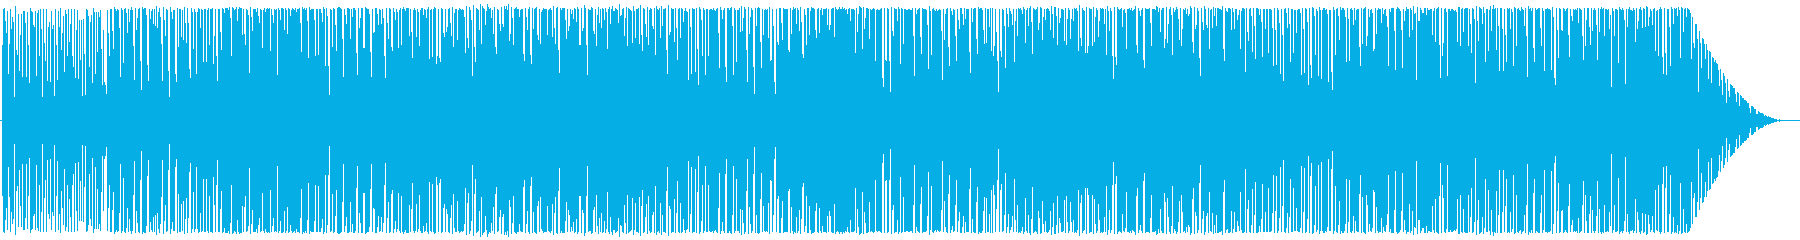 Deep House系インスト曲2の再生済みの波形